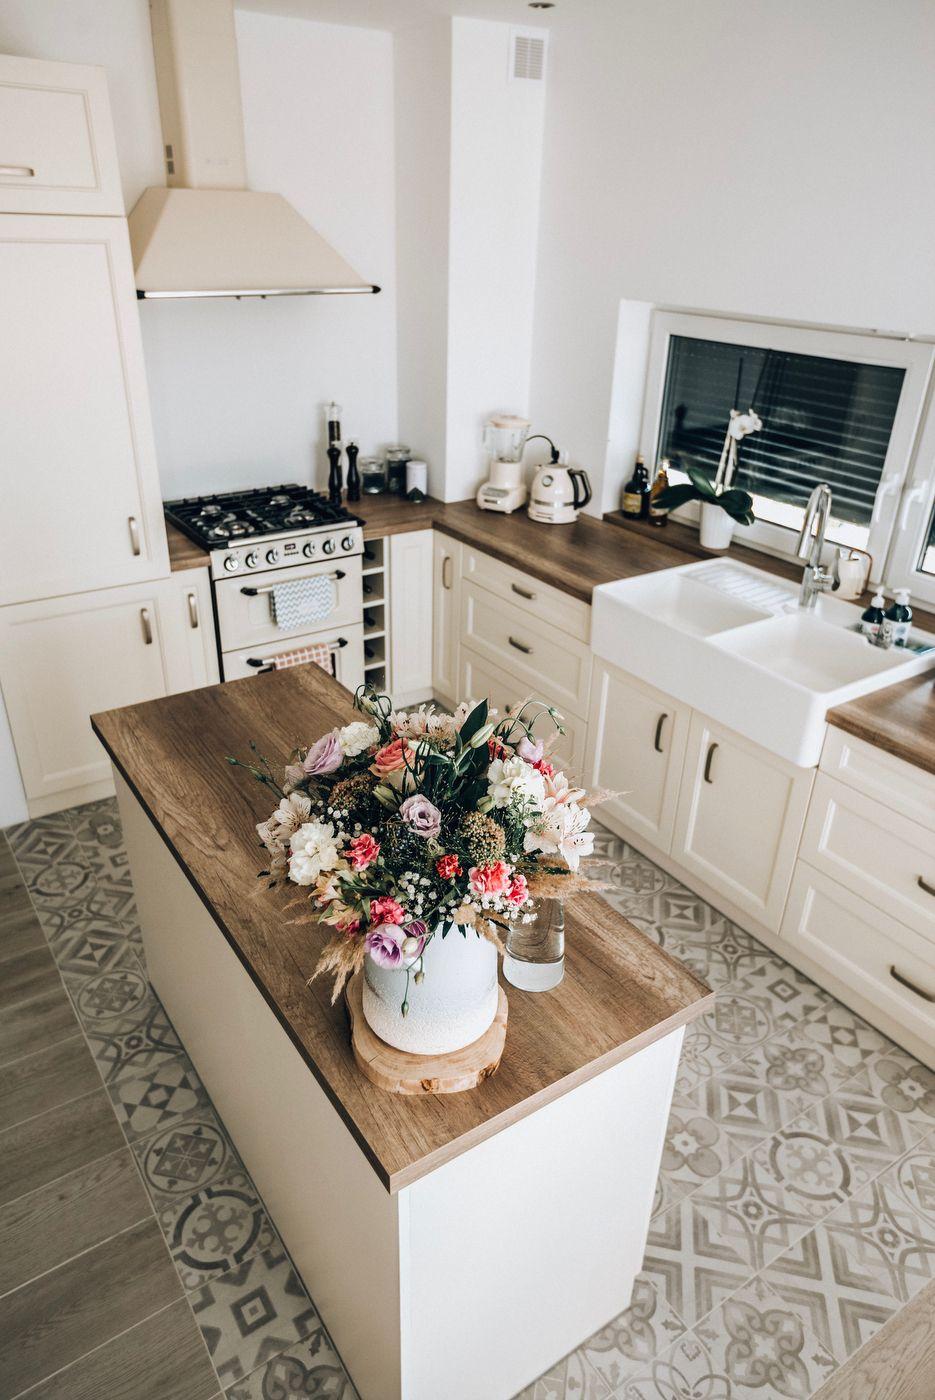 Nasze Wnetrza Kuchnia Czyli Serce Domu Beauty Fashion Shopping Kitchen Interior Home Decor